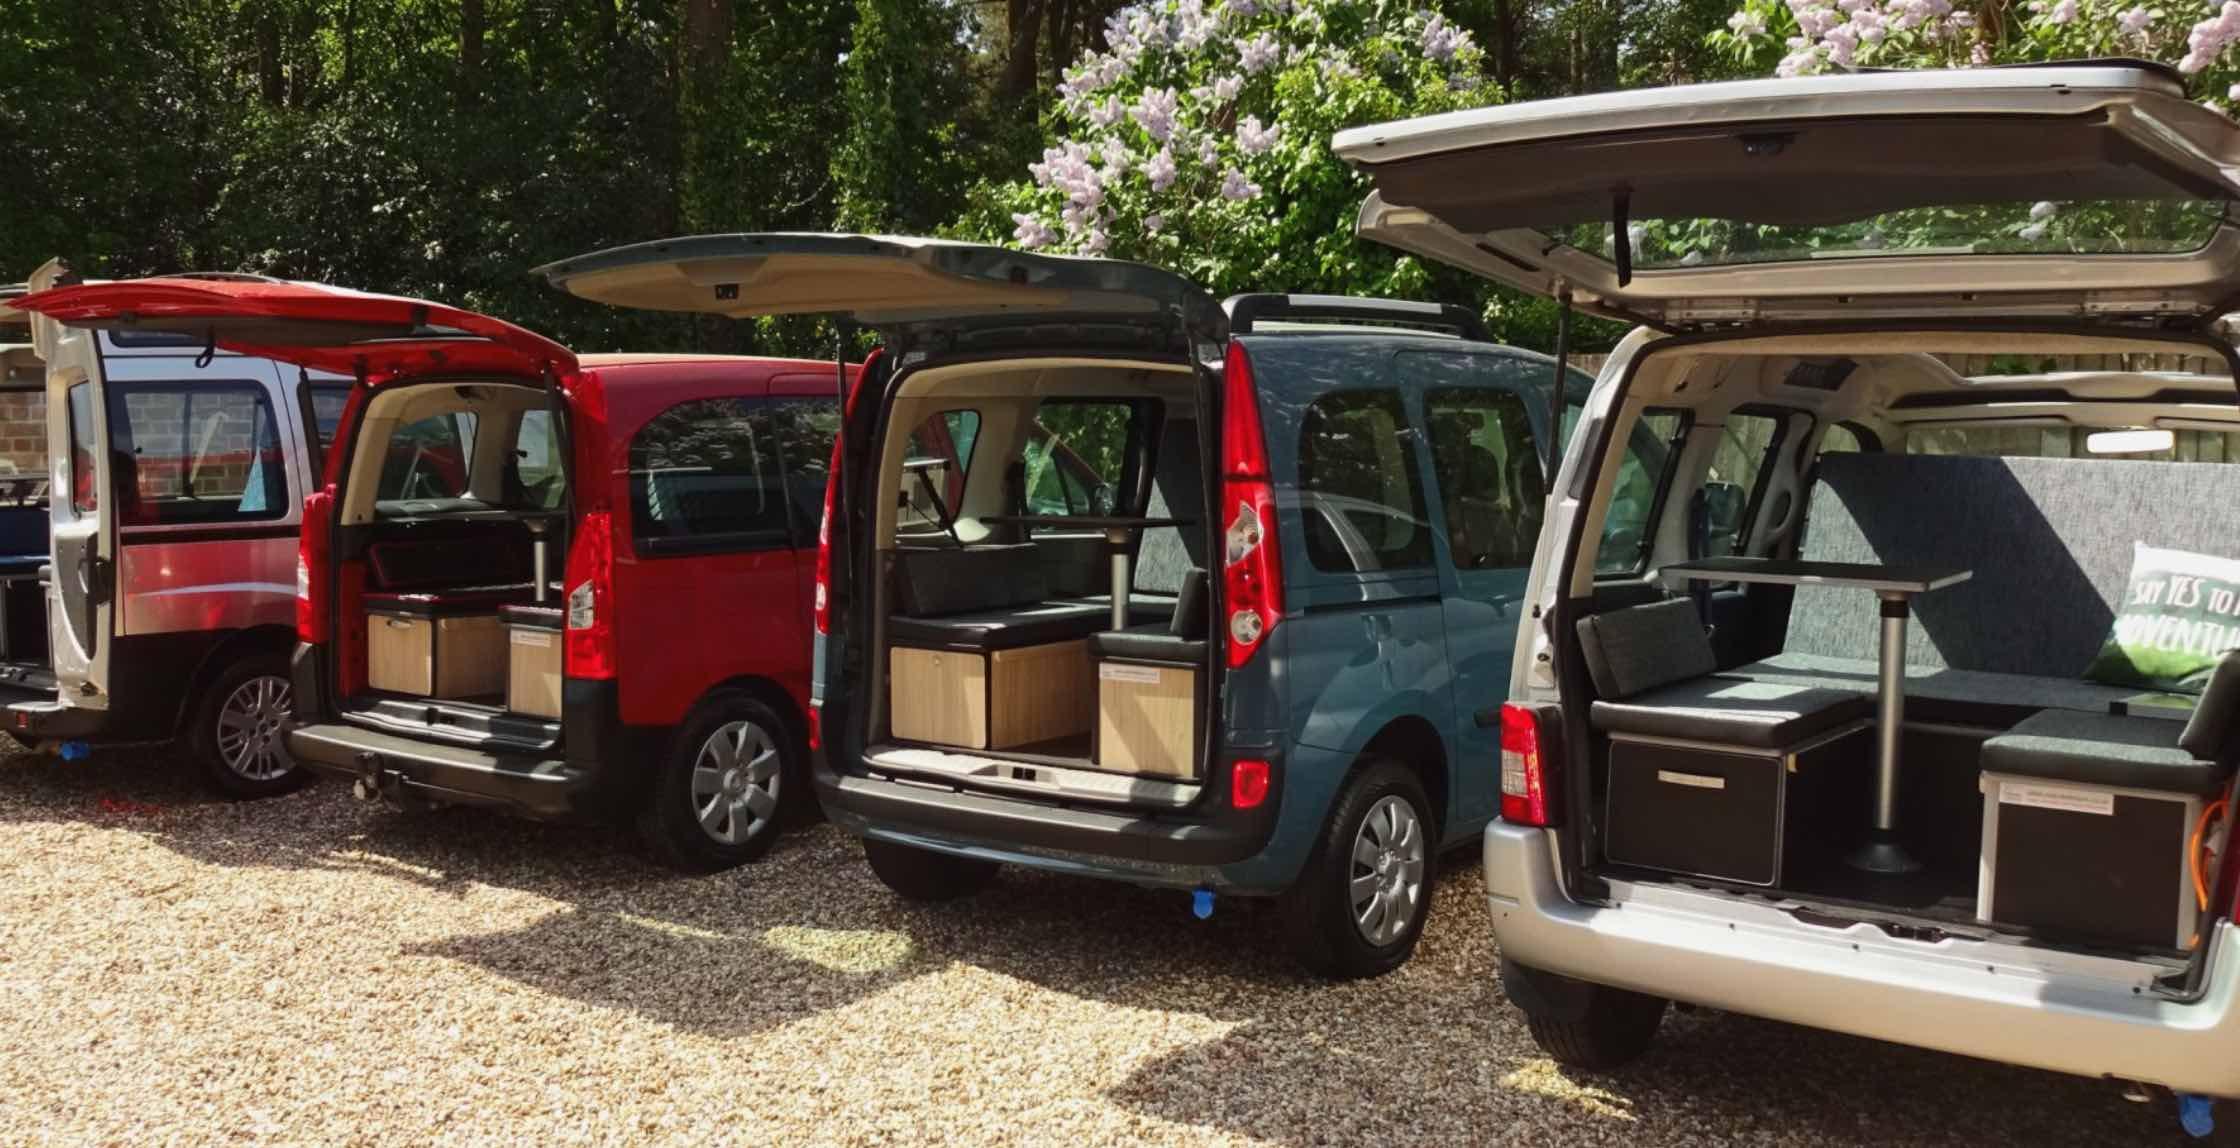 Citroen Berlingo, Ford Tourneo Connect, Peugeot Partner Camper (Redcoteleisure)